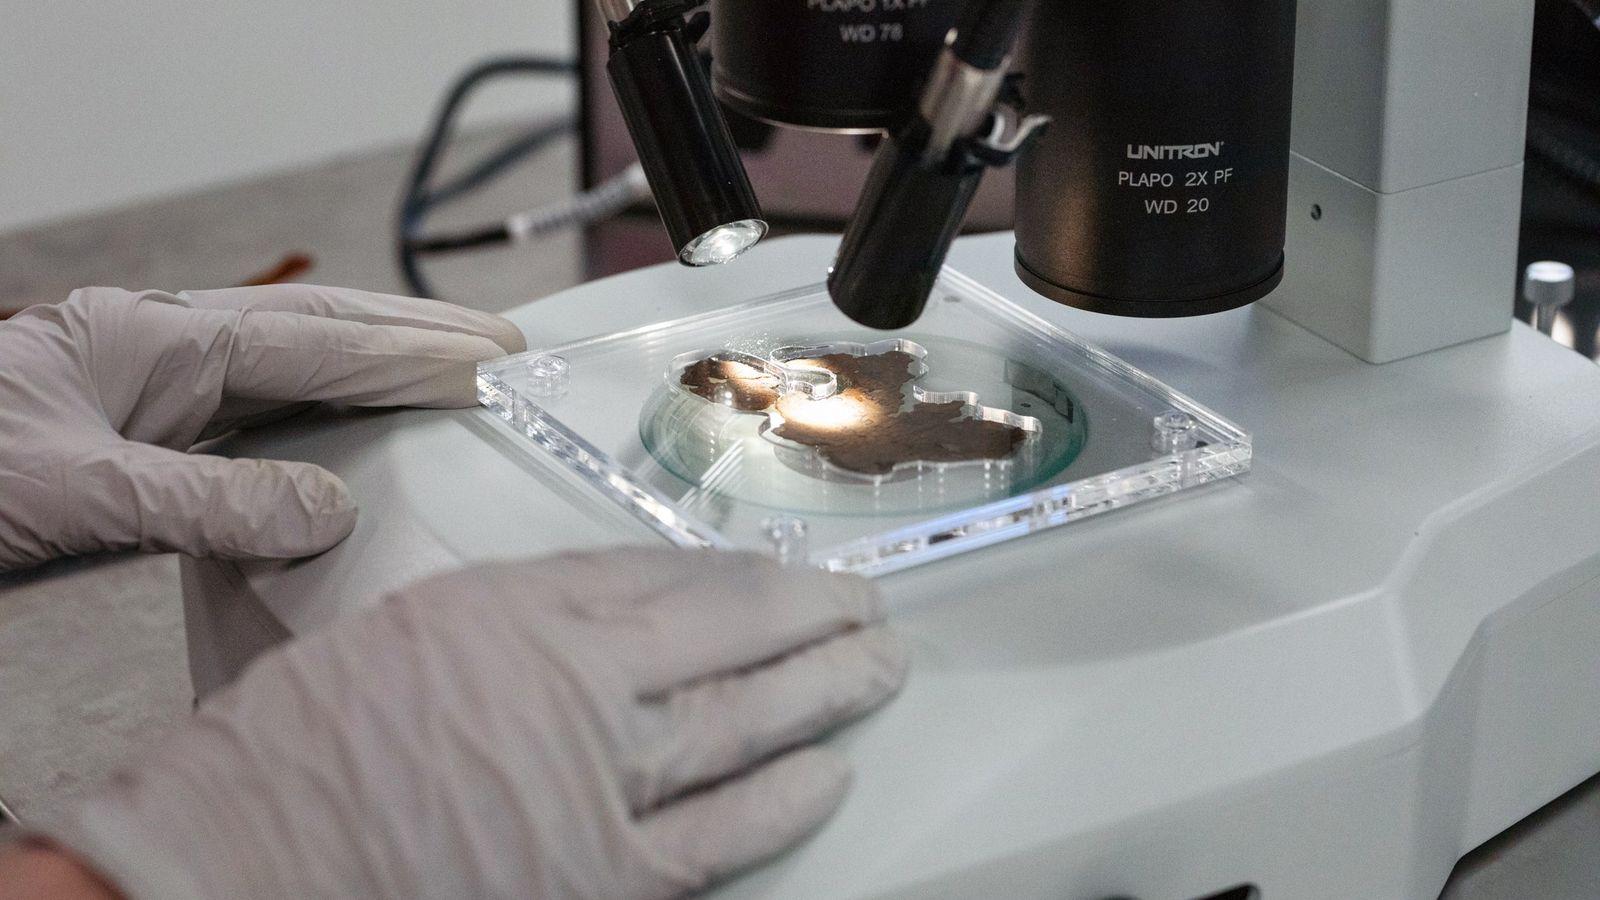 Os investigadores examinaram cuidadosamente as superfícies dos 16 fragmentos ao microscópio – mantendo intactas as partes ...